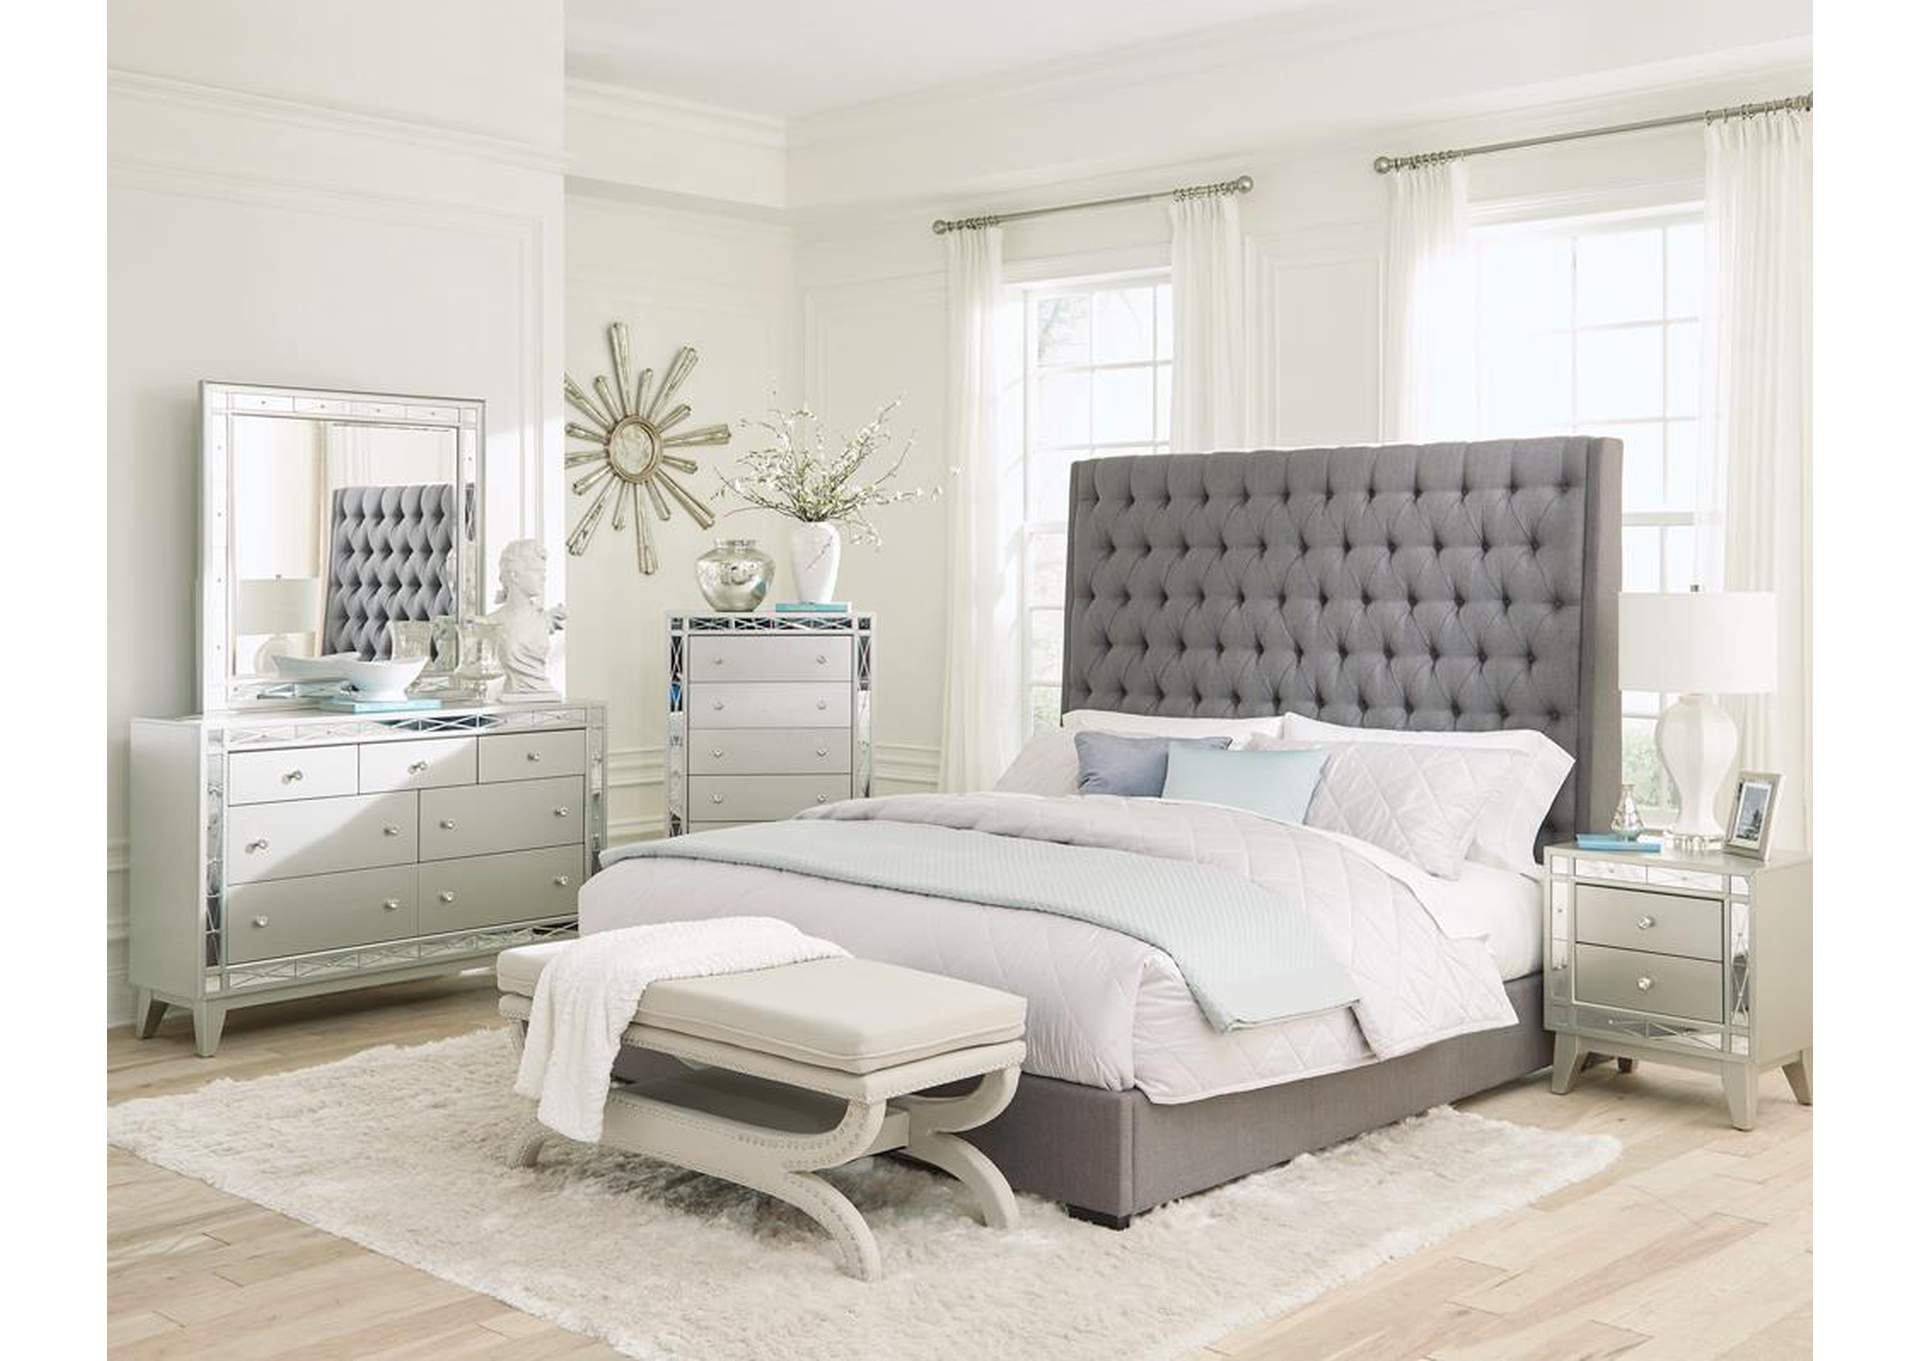 Westar 5 Piece Eastern King Bedroom Set Best Buy Furniture And Mattress